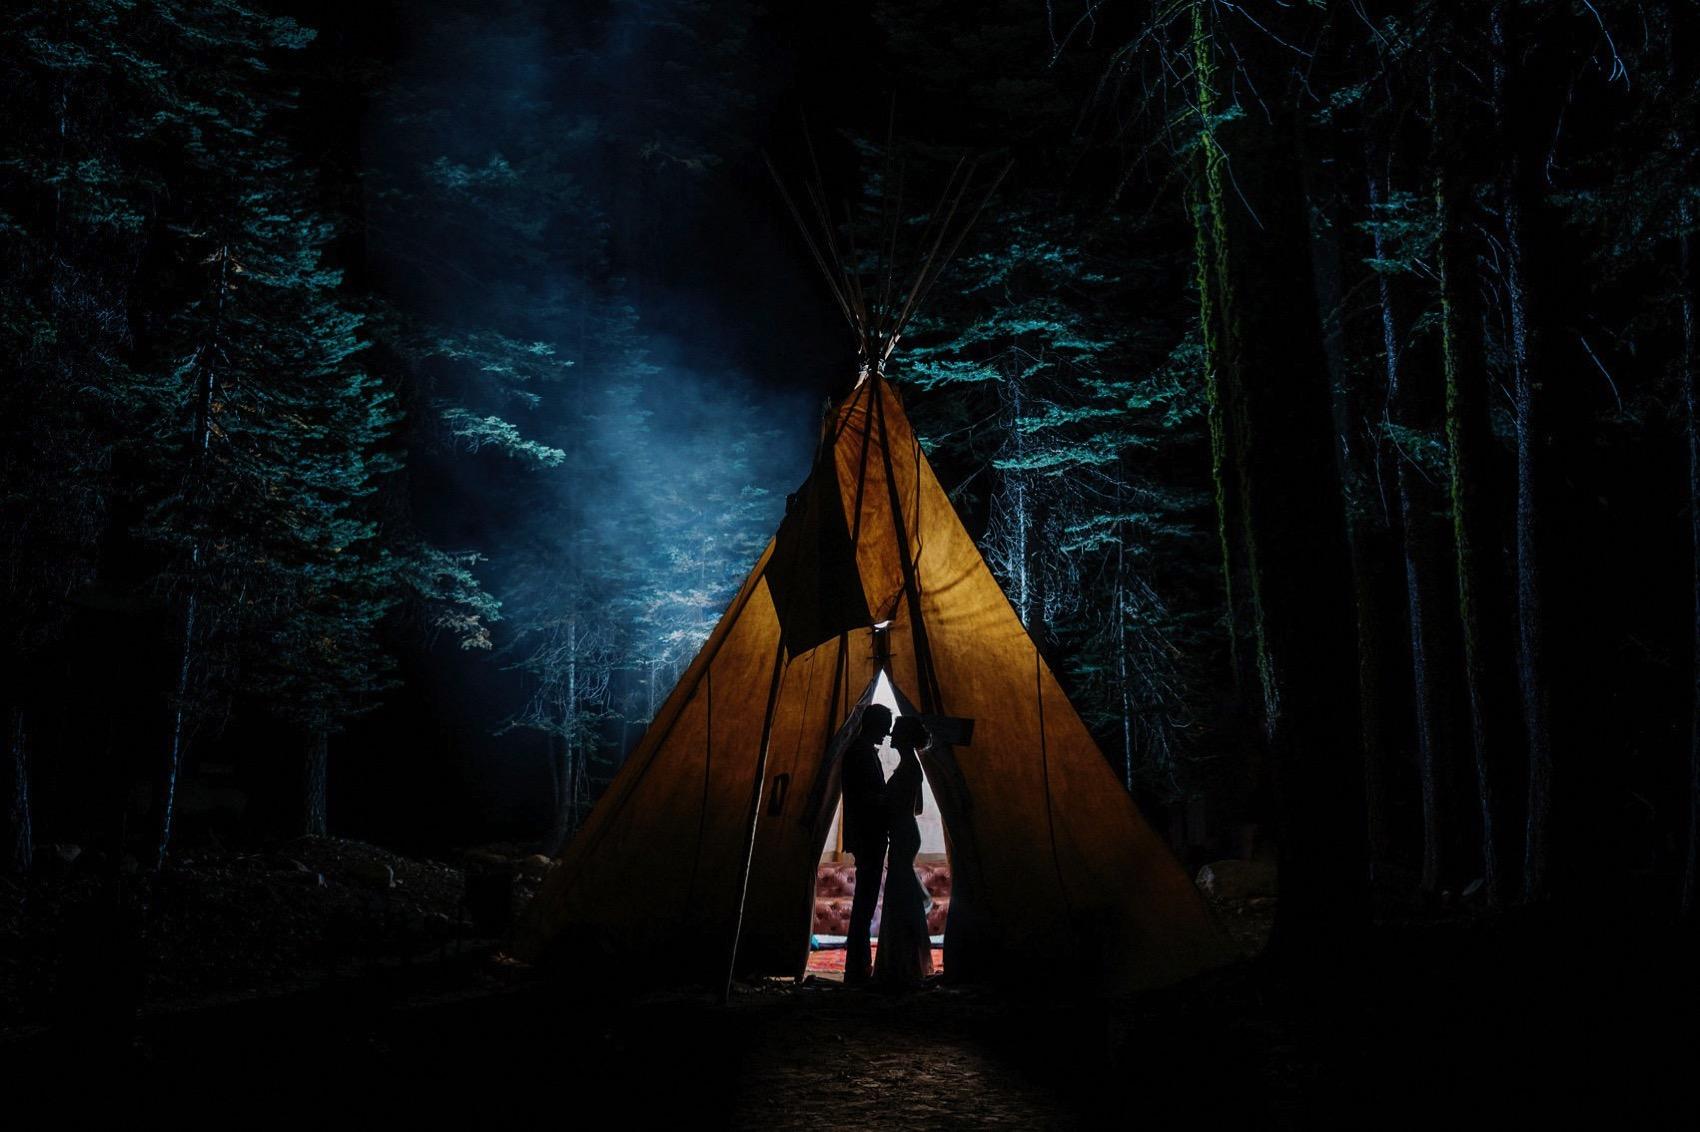 camp-shaffer-wedding-the-goodness-photo-218-photo.jpg